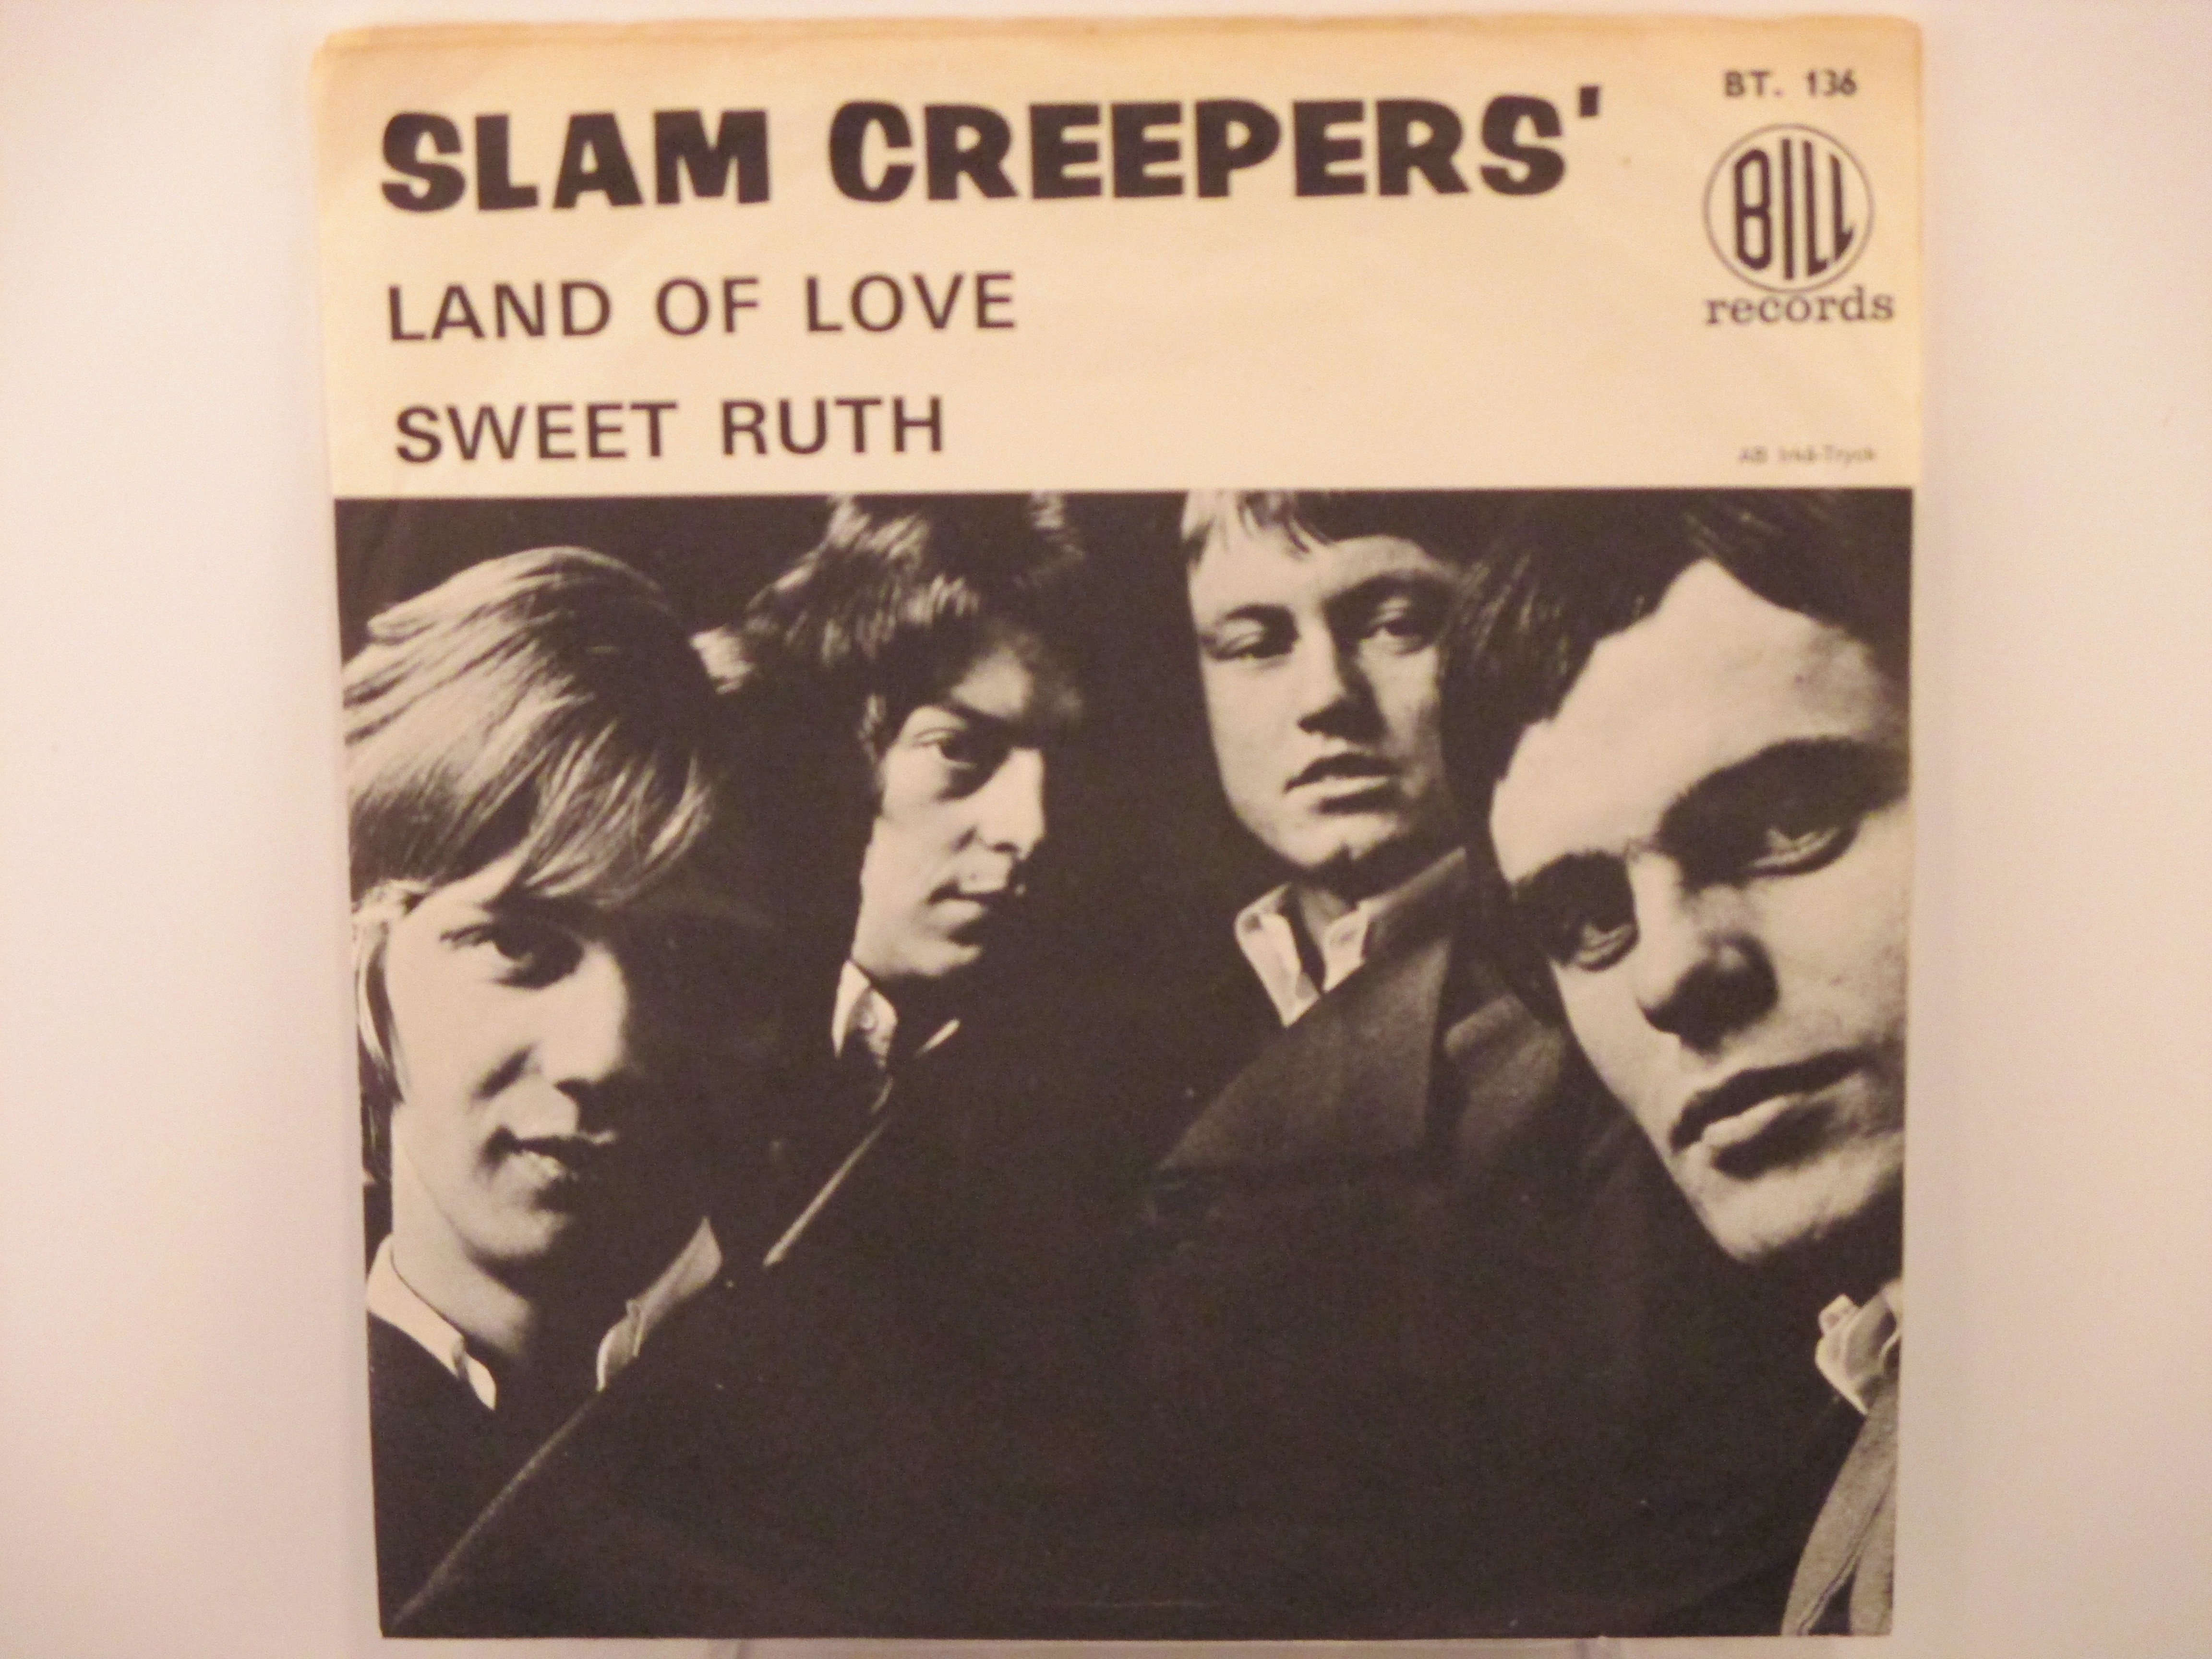 SLAM CREEPERS : Land of love / Sweet Ruth